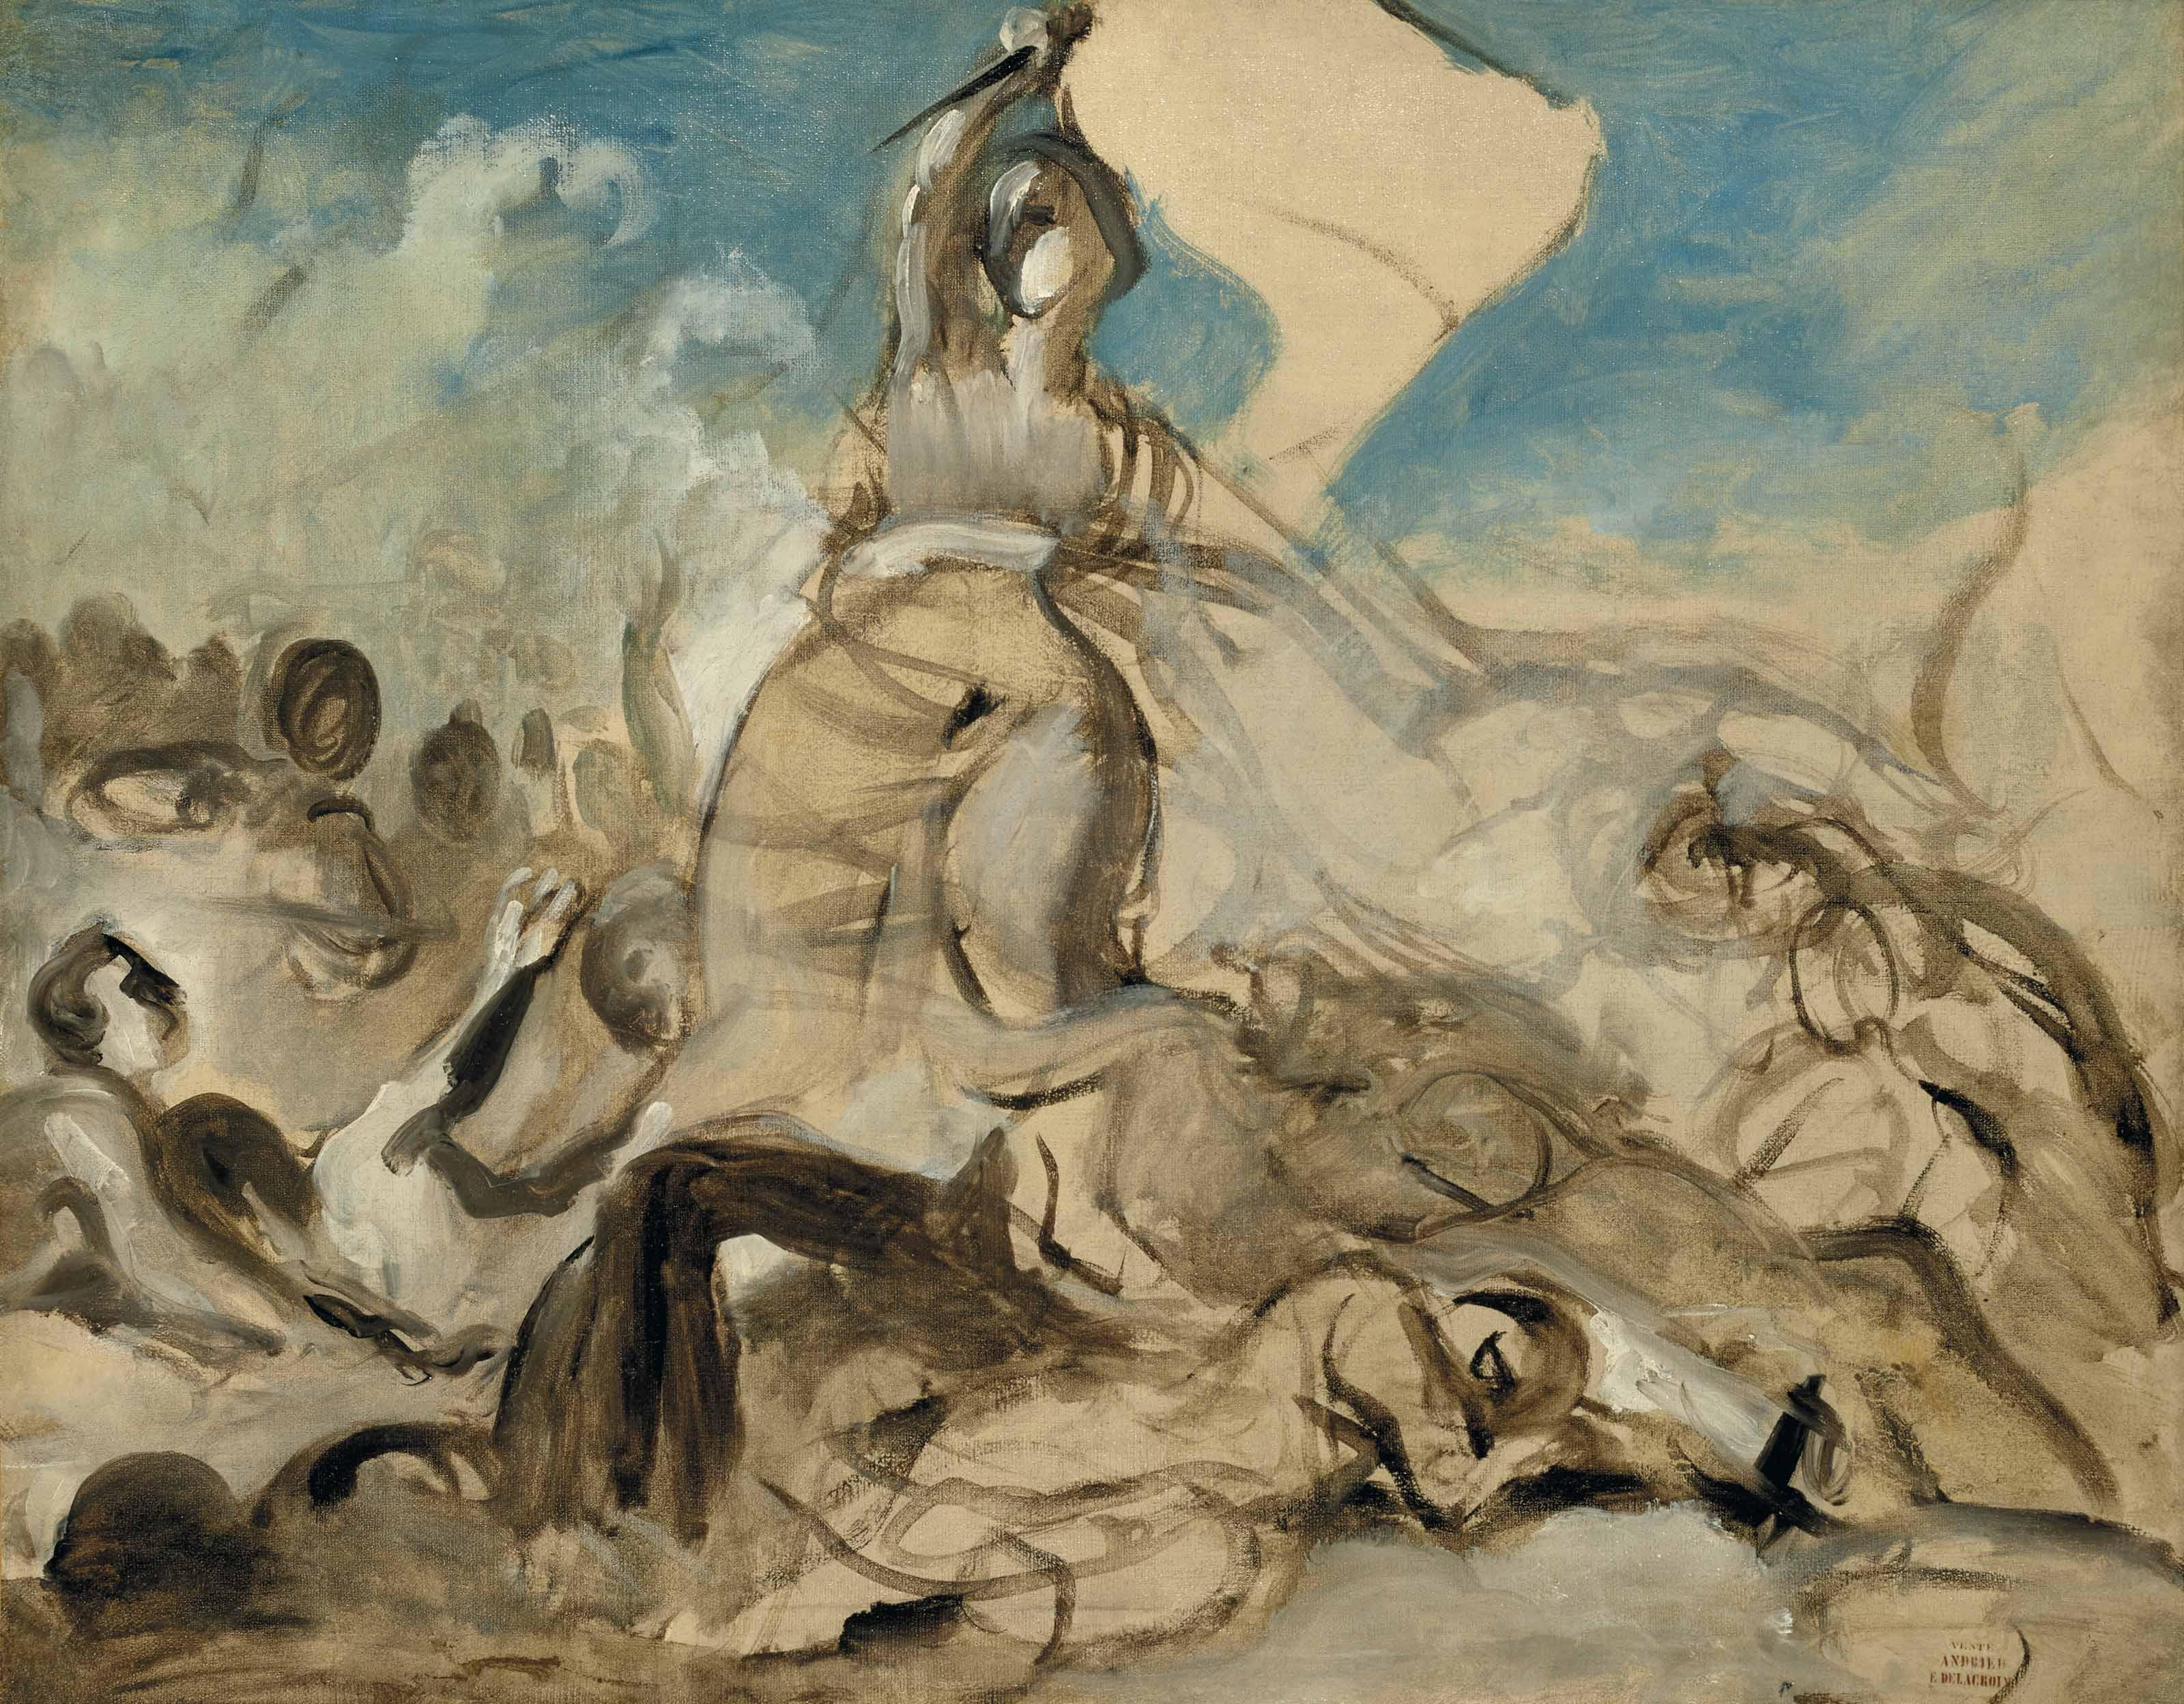 Eugène Delacroix (French, 1798-1863)